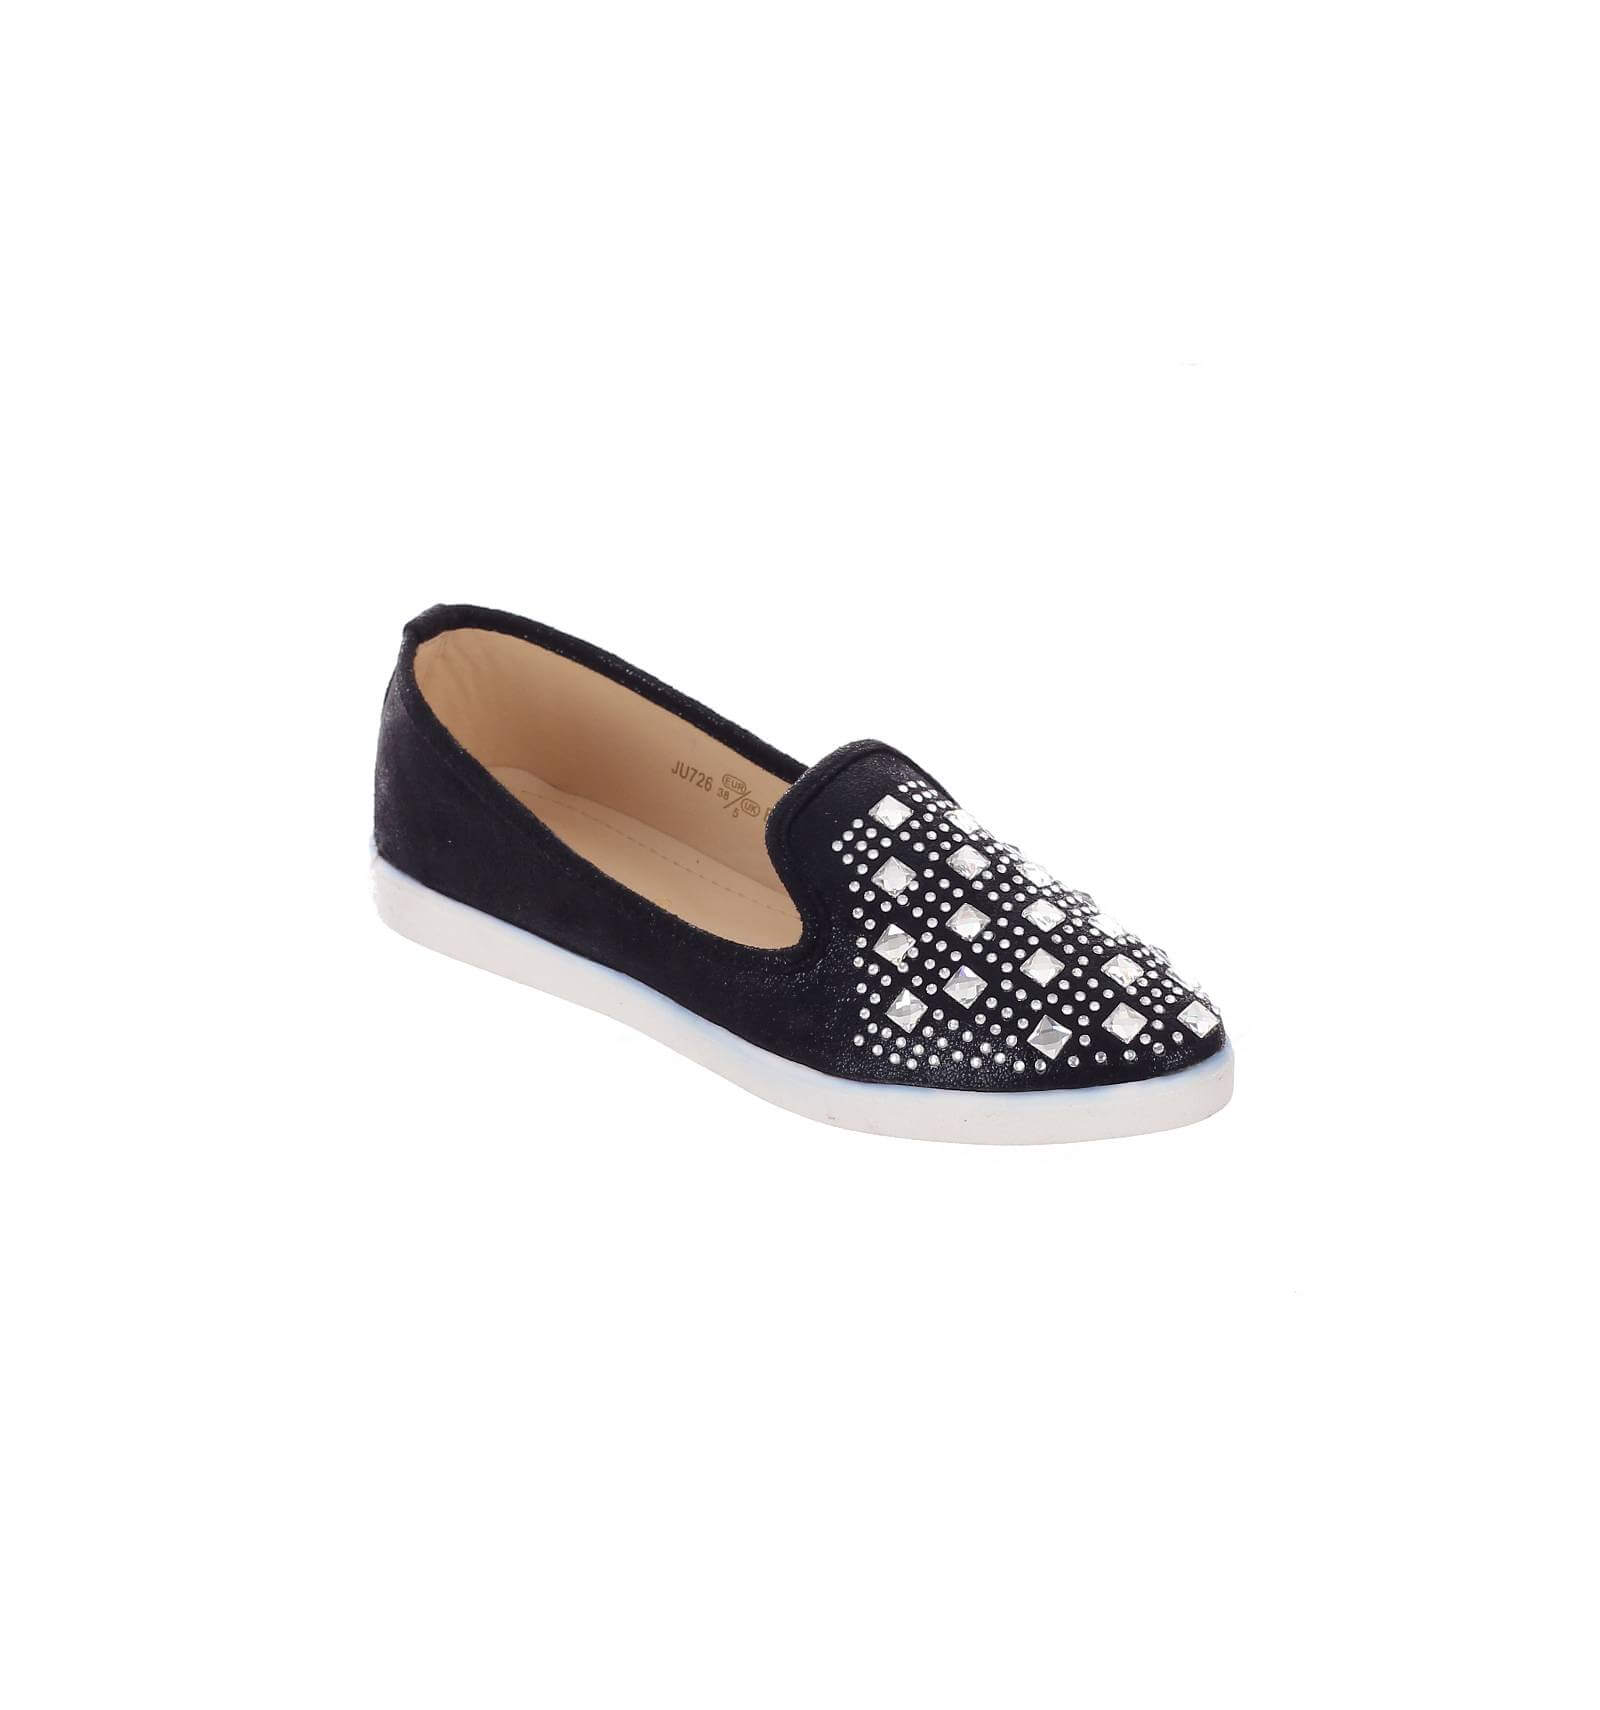 Baskets STEP ON femme à dentelle et strass noir OMELLA - Couleur:Noir Pointure:3 dA9AA